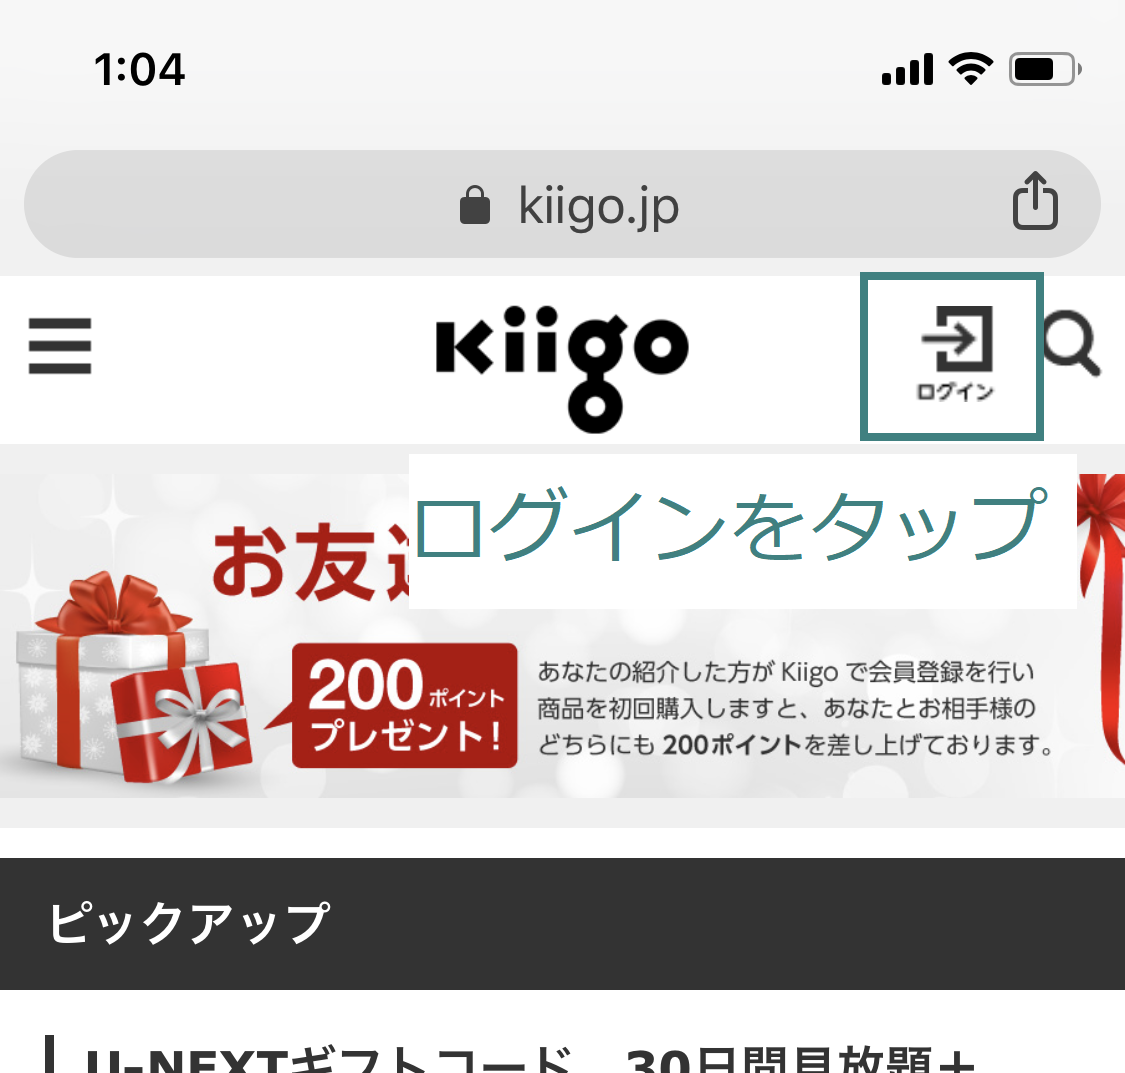 f:id:Sabuaka:20190314010708p:plain